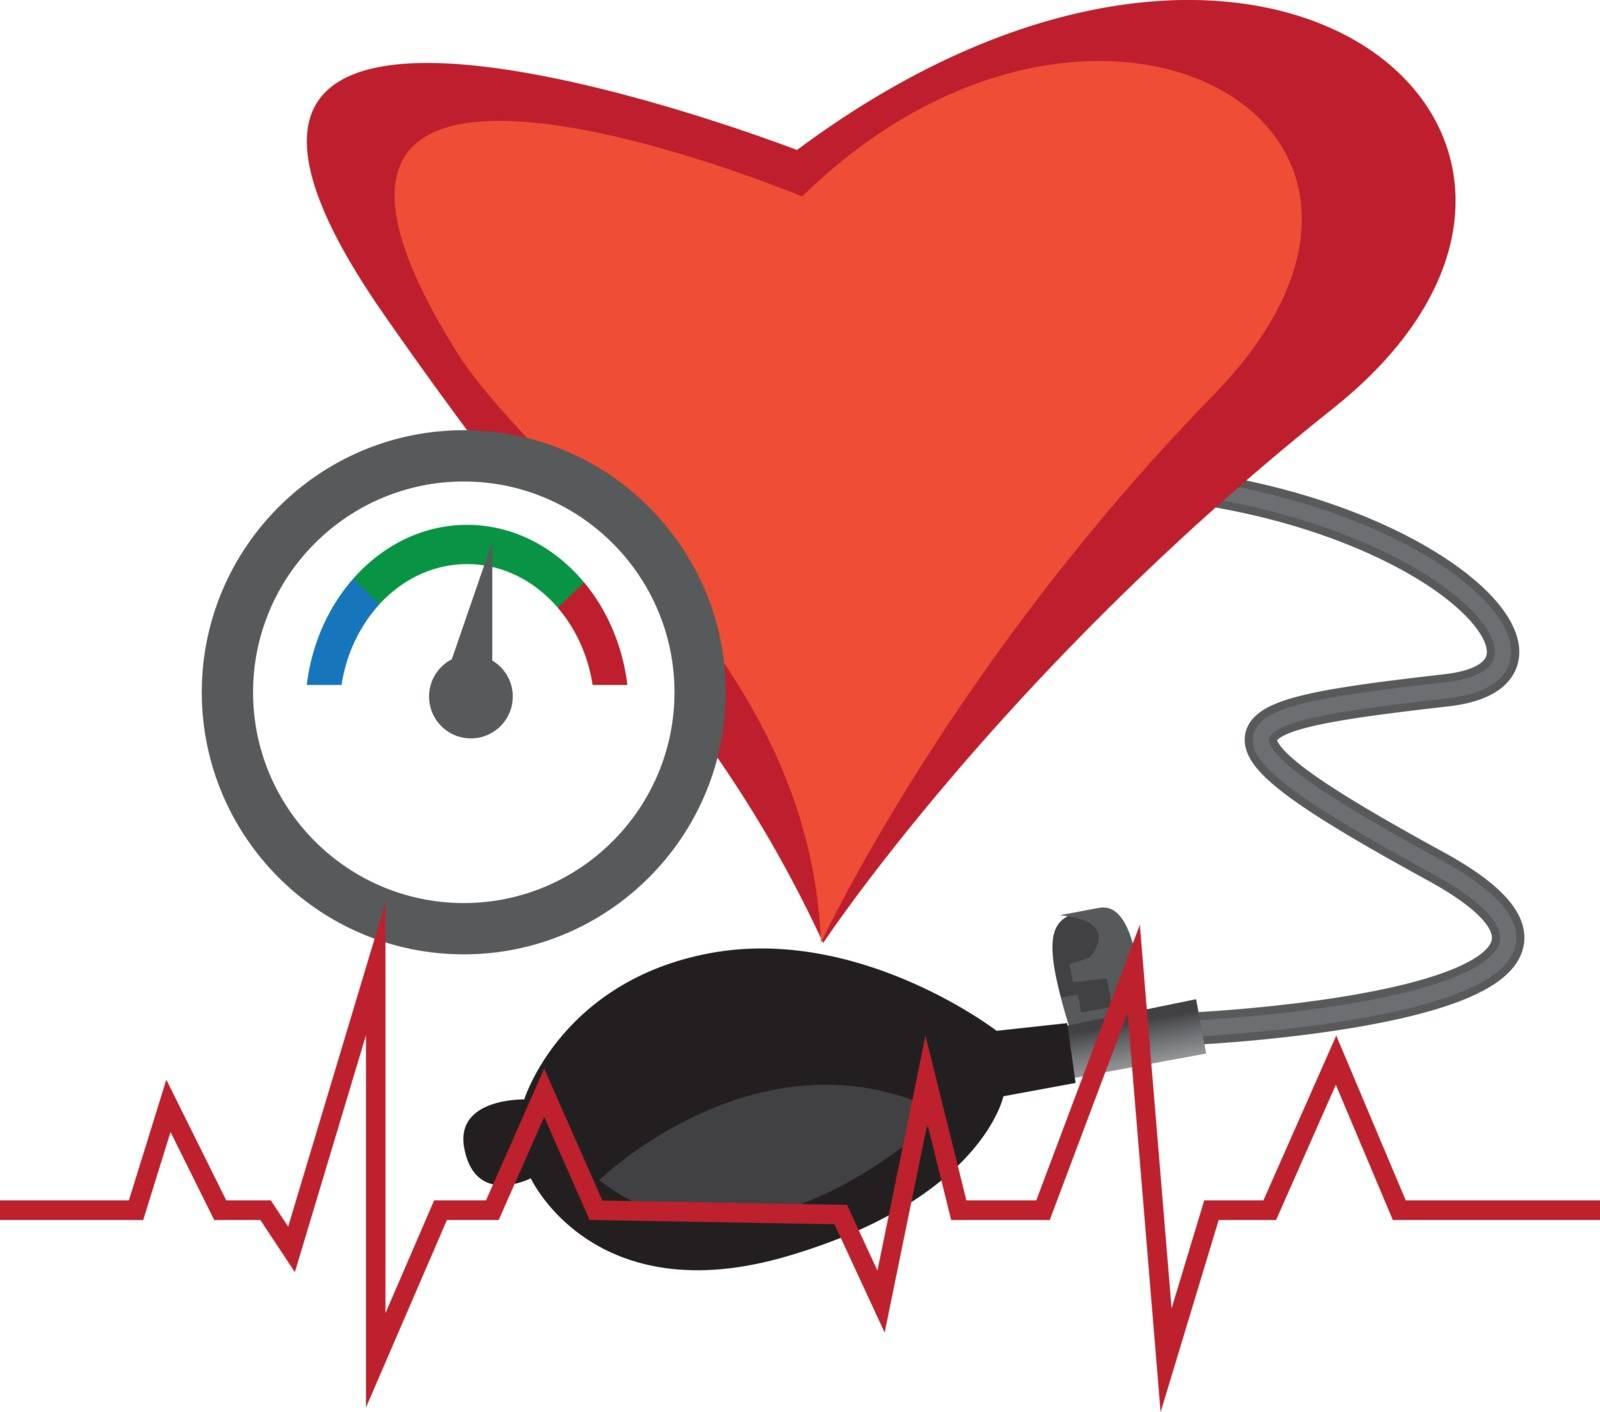 Blood pressure measuring vector illustration on a white background